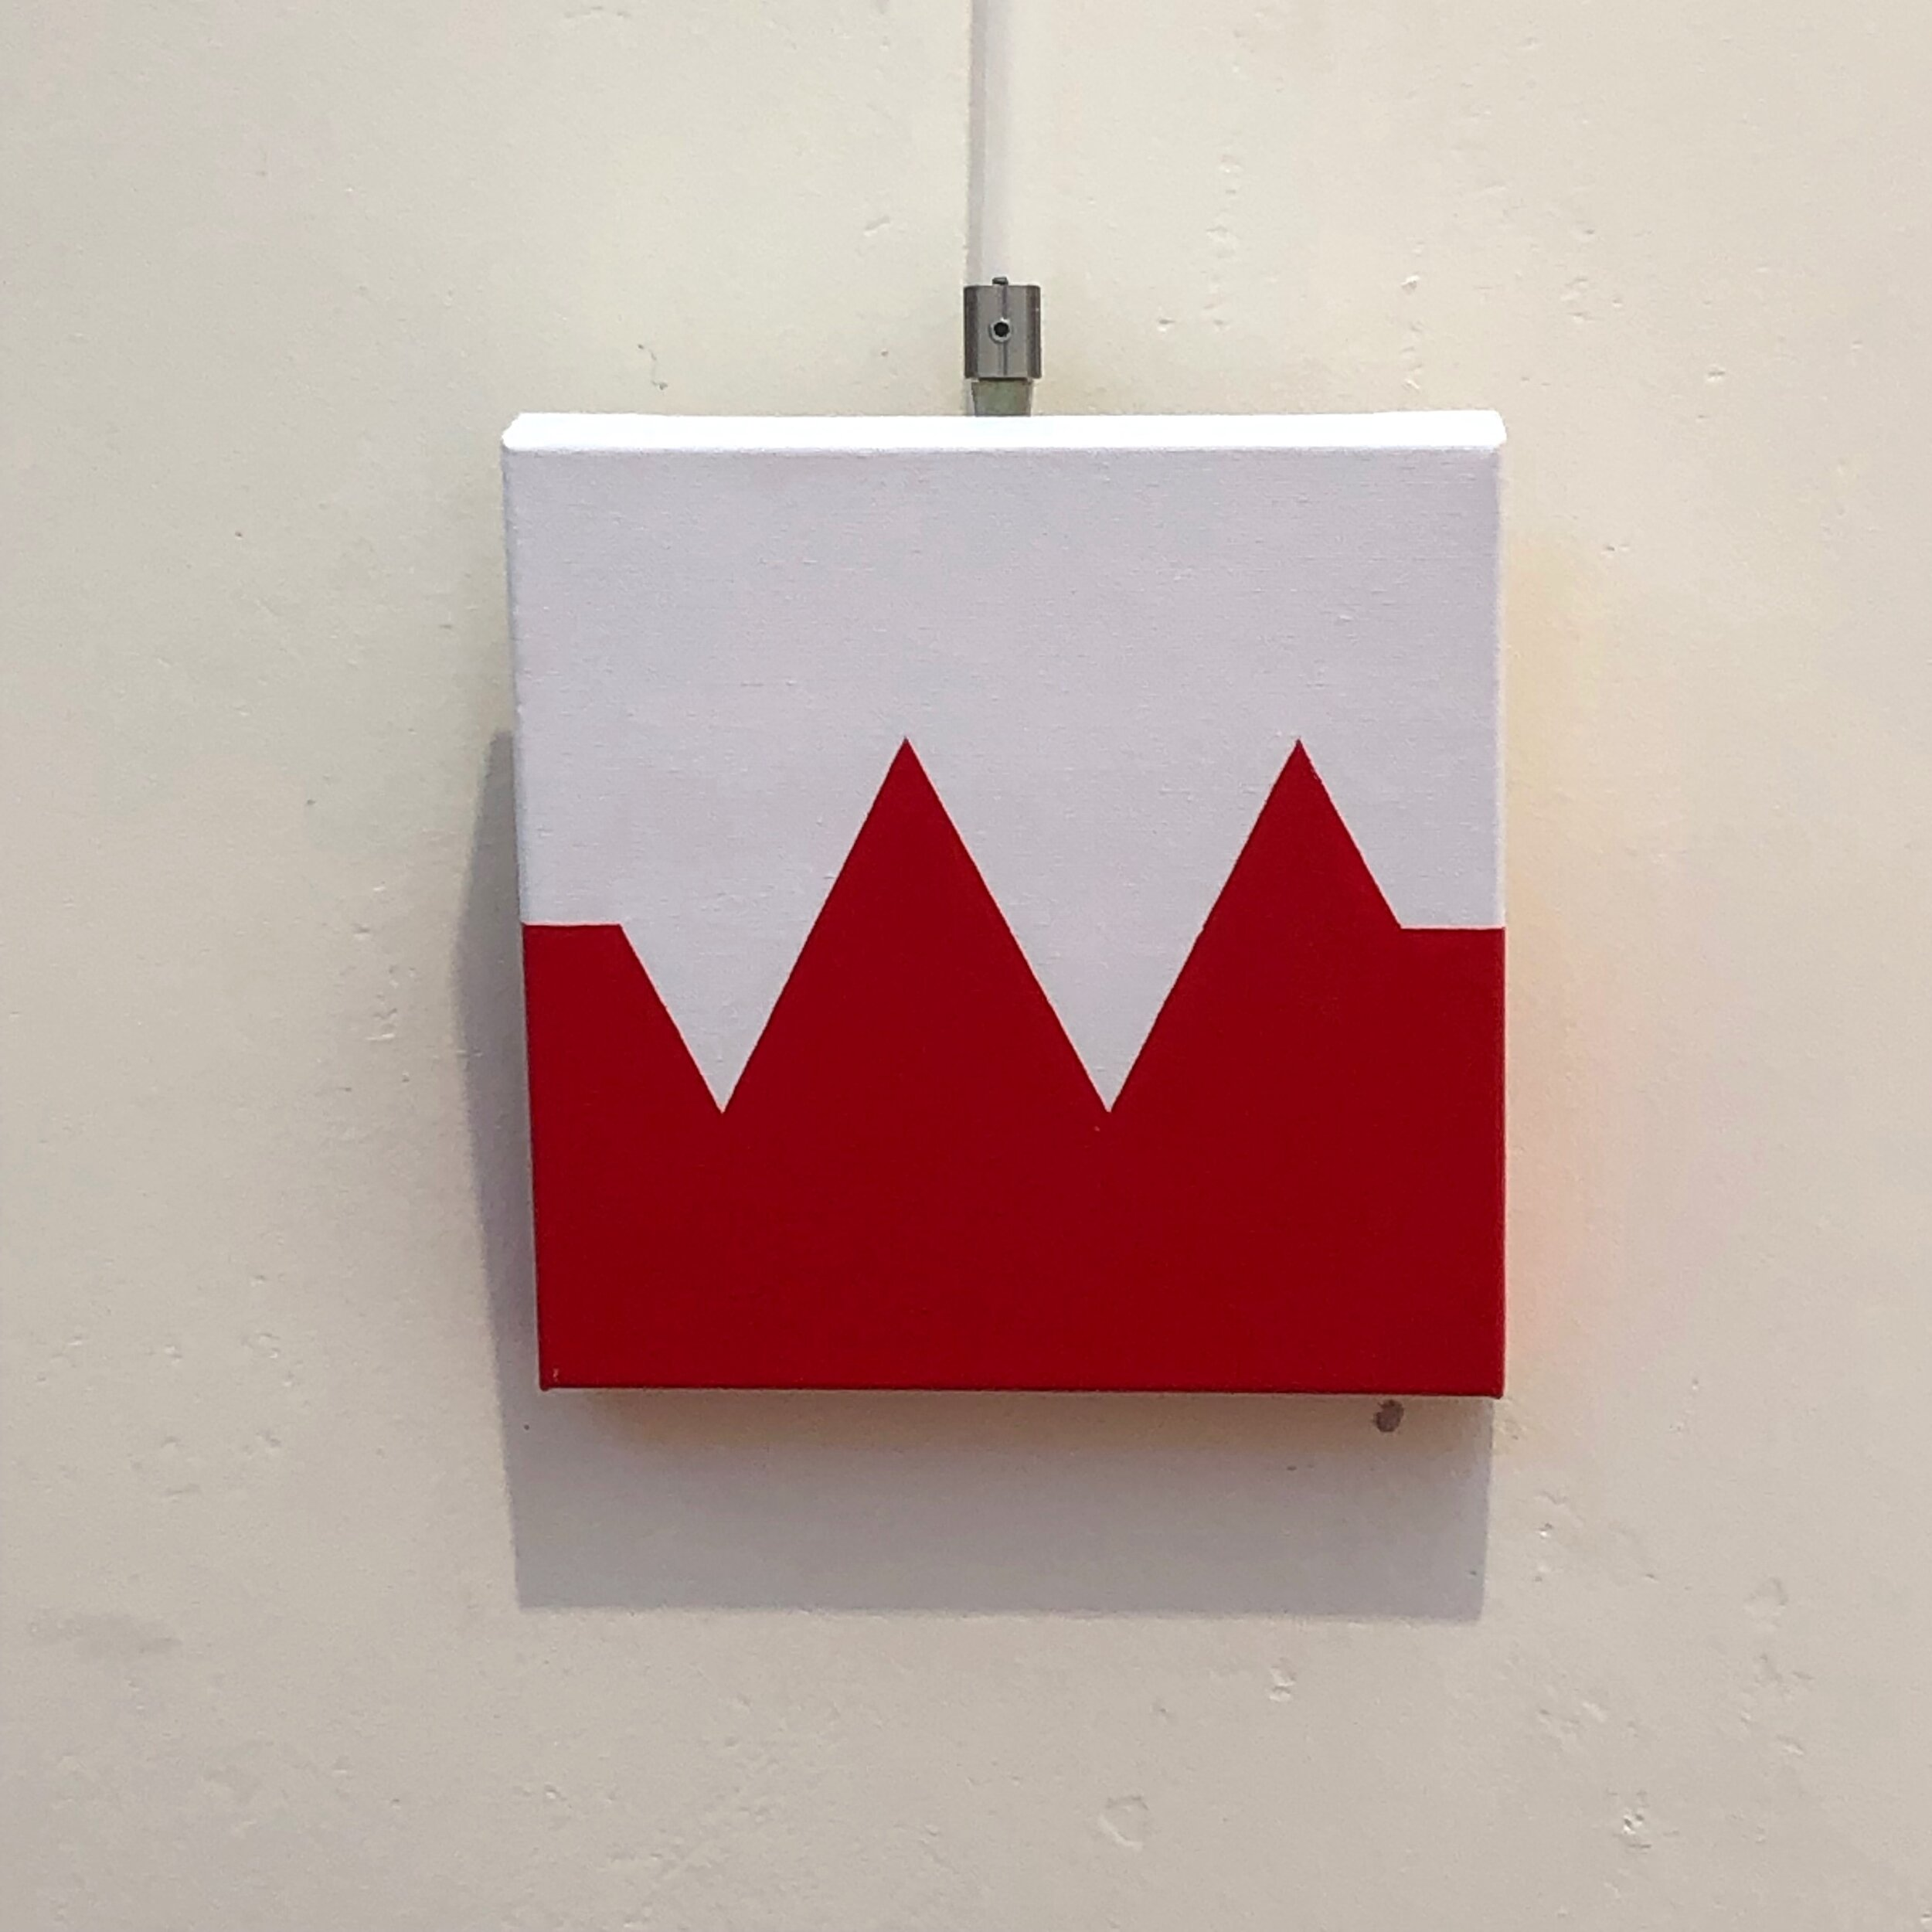 Tom Loveday,  Resistance , 2015, acrylic on canvas, 25 x 25 x 3.5 cm.